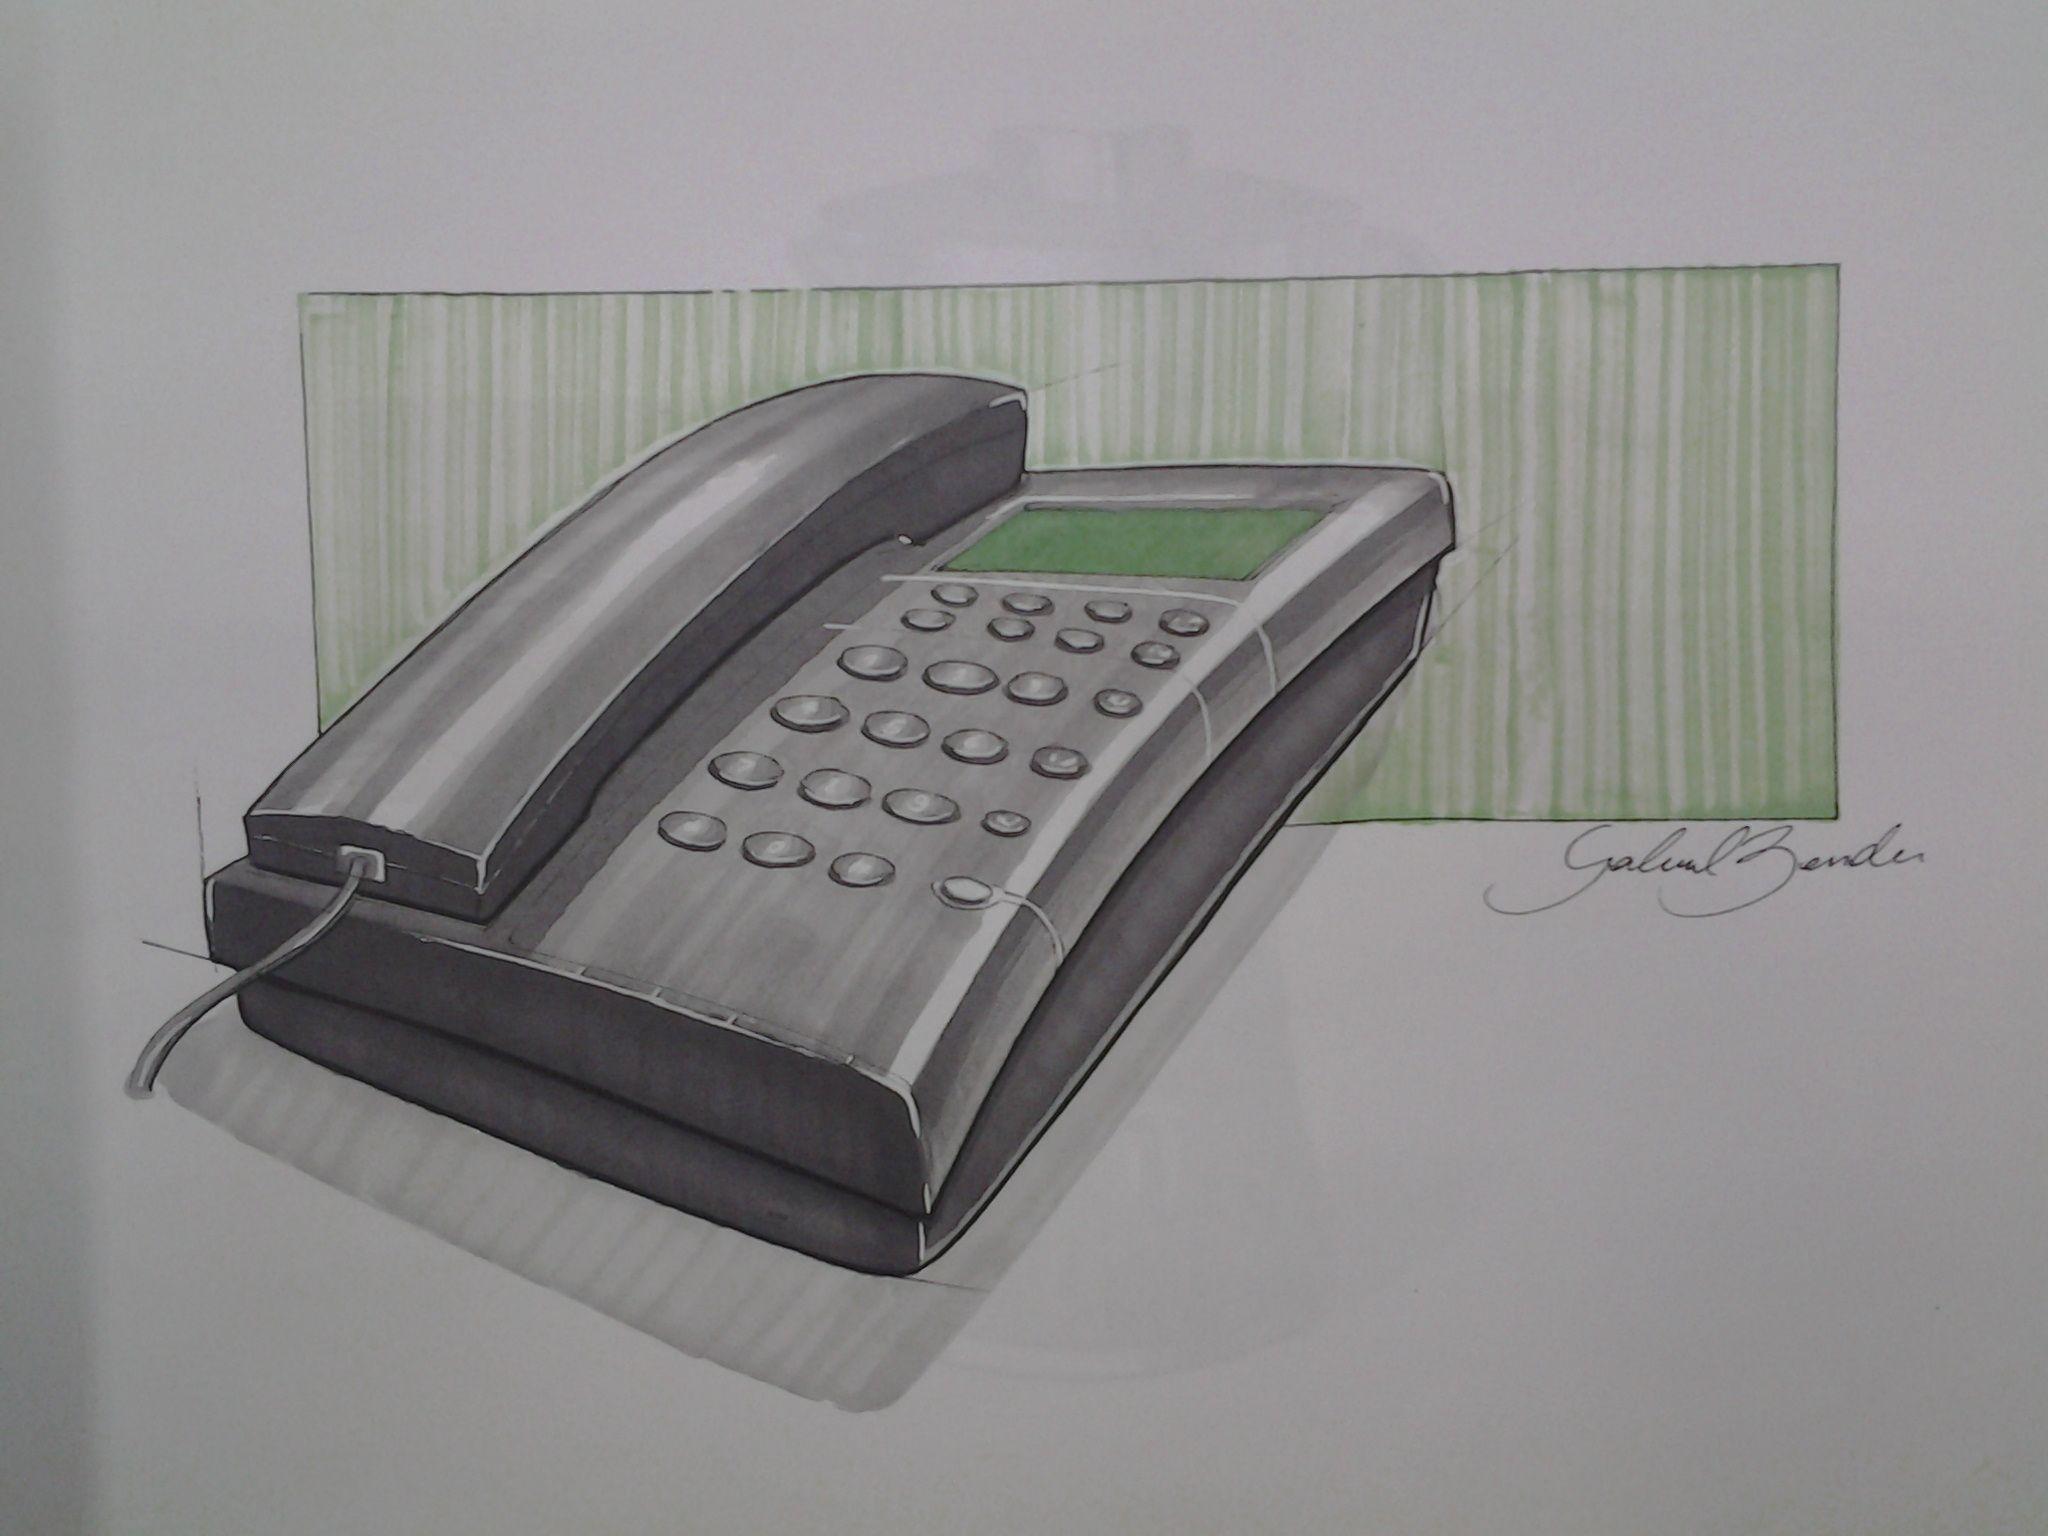 Sketch by Gabriel Ribeiro Bender - 2014